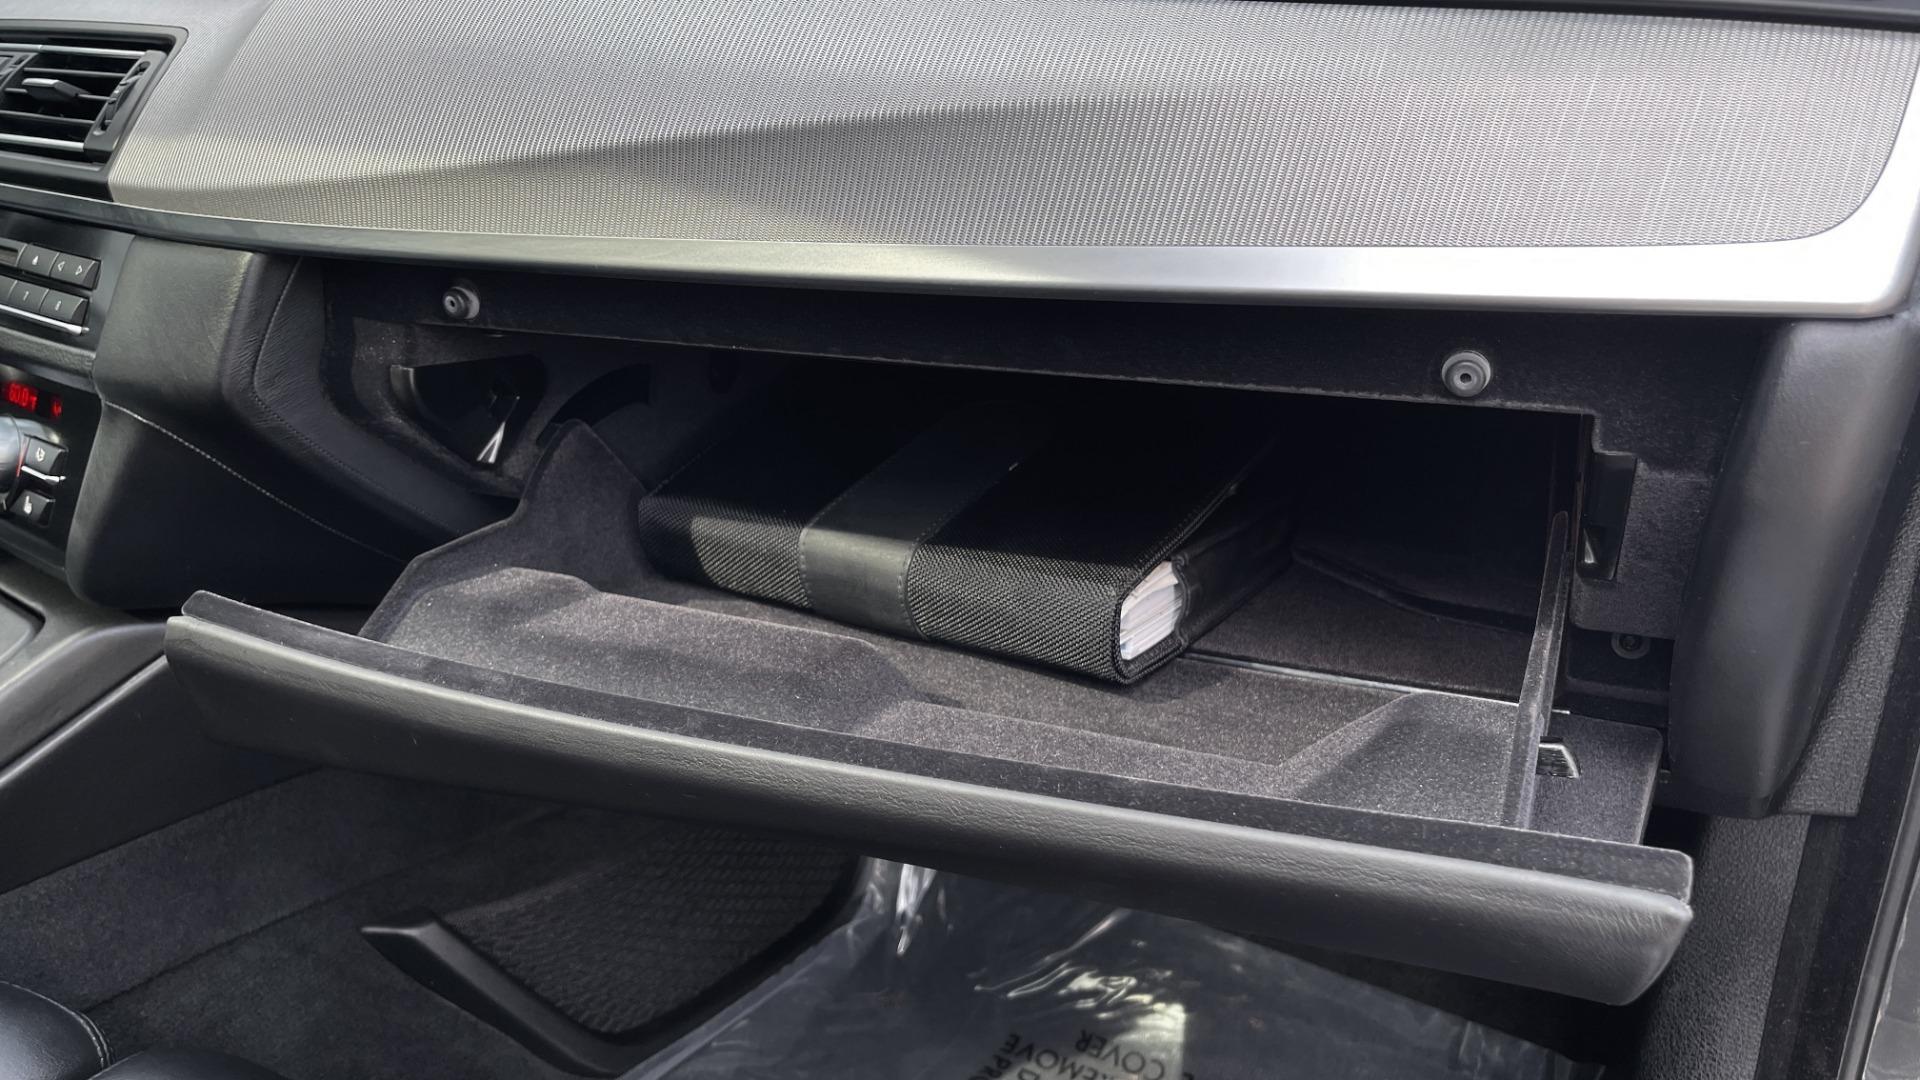 Used 2015 BMW M5 SEDAN / EXEC PKG / HUD / NAV / B&O SND / SUNROOF / REARVIEW for sale Sold at Formula Imports in Charlotte NC 28227 97